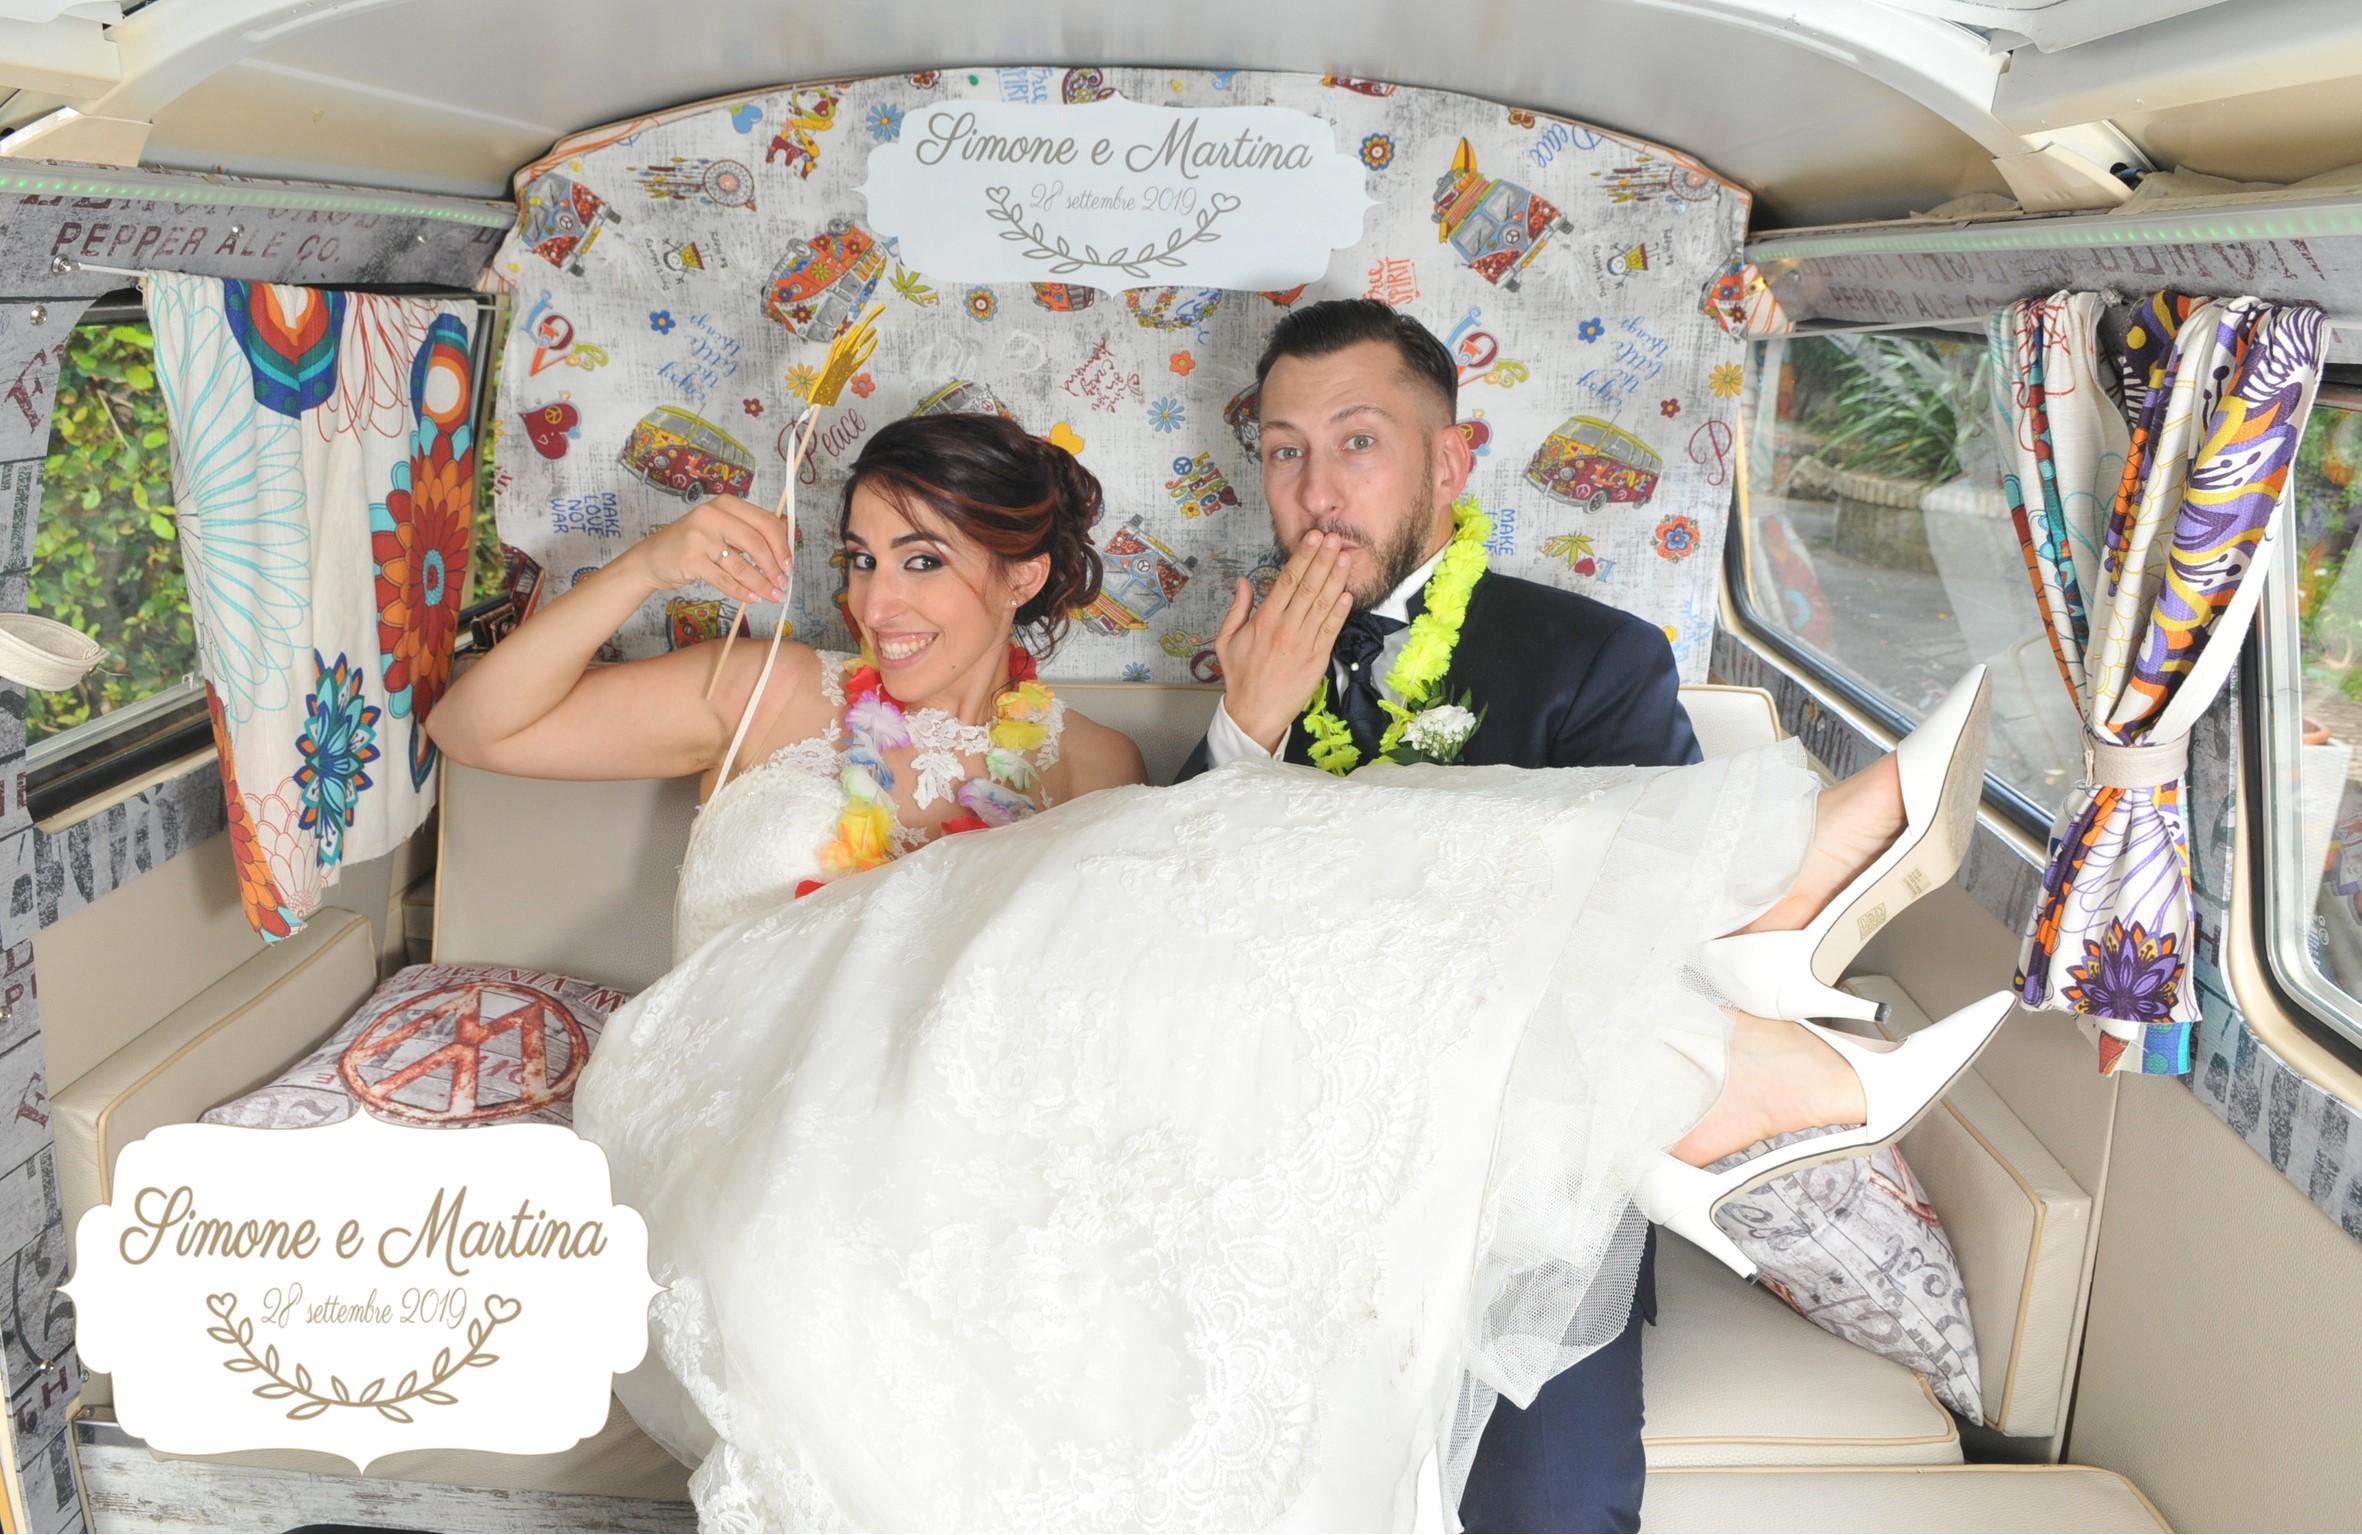 patrizi-fotografi-matrimoni-photobooth-simone-e-martina-22